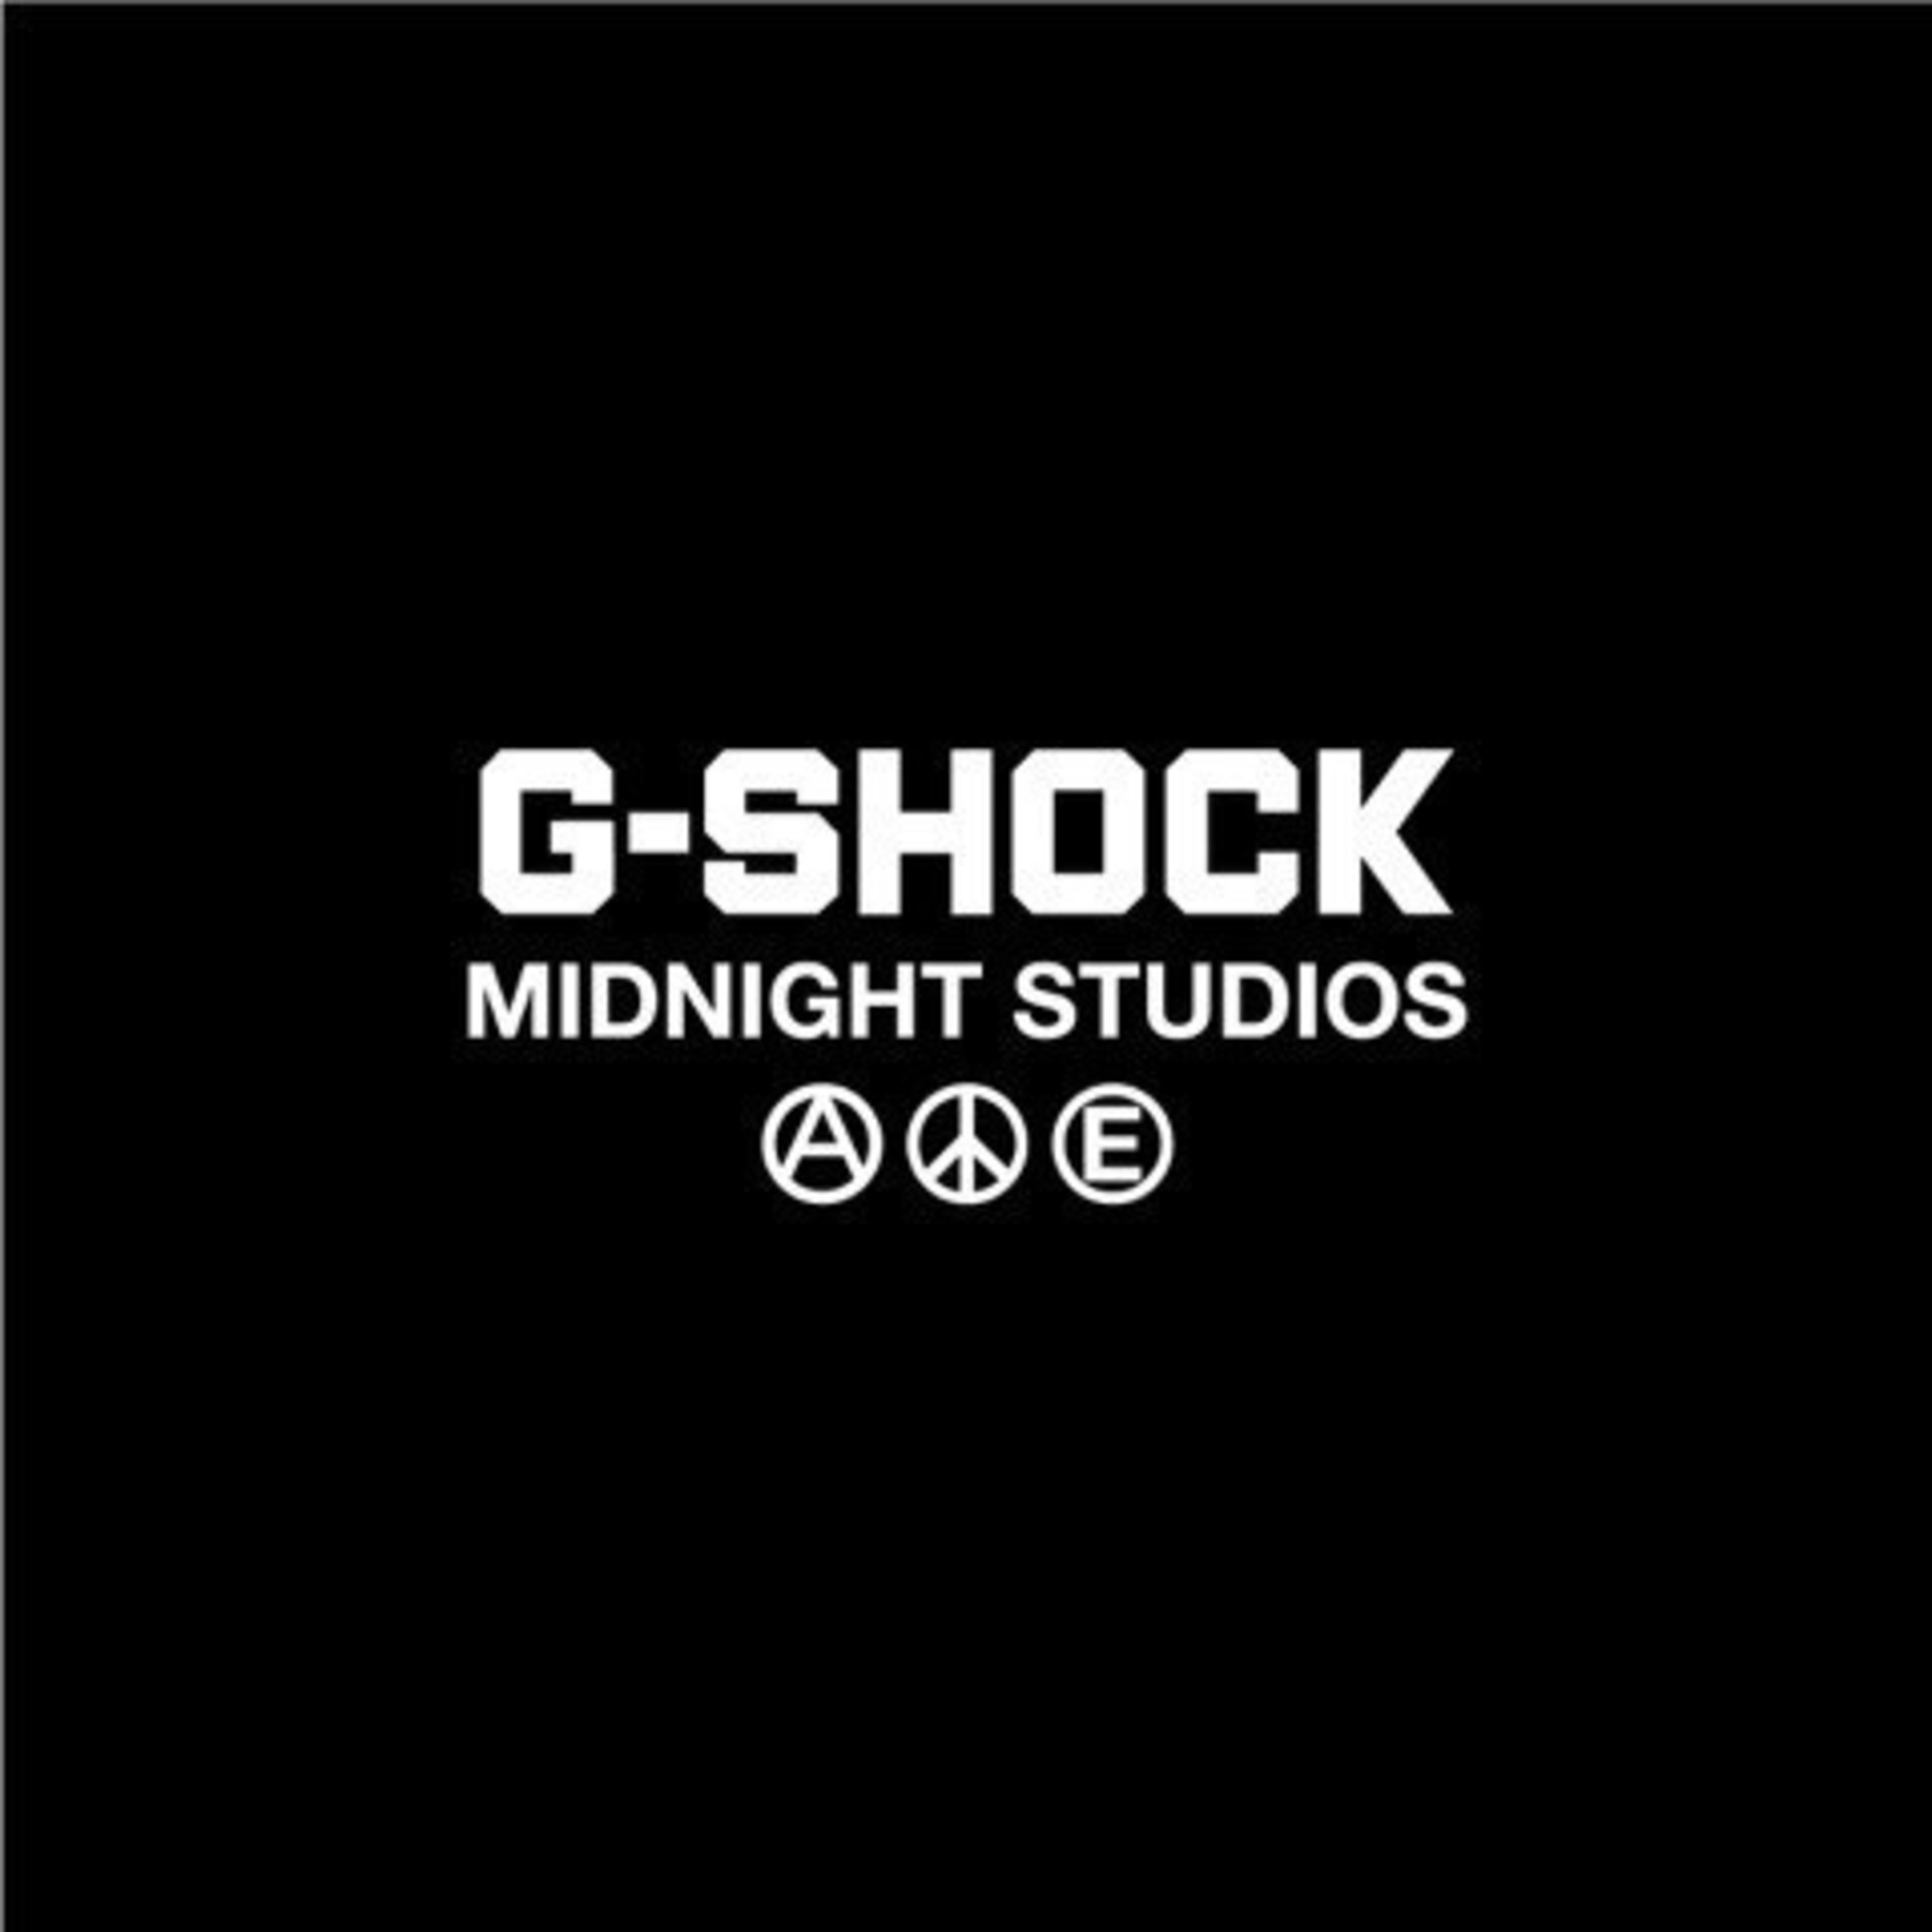 G-SHOCK x Midnight Studios